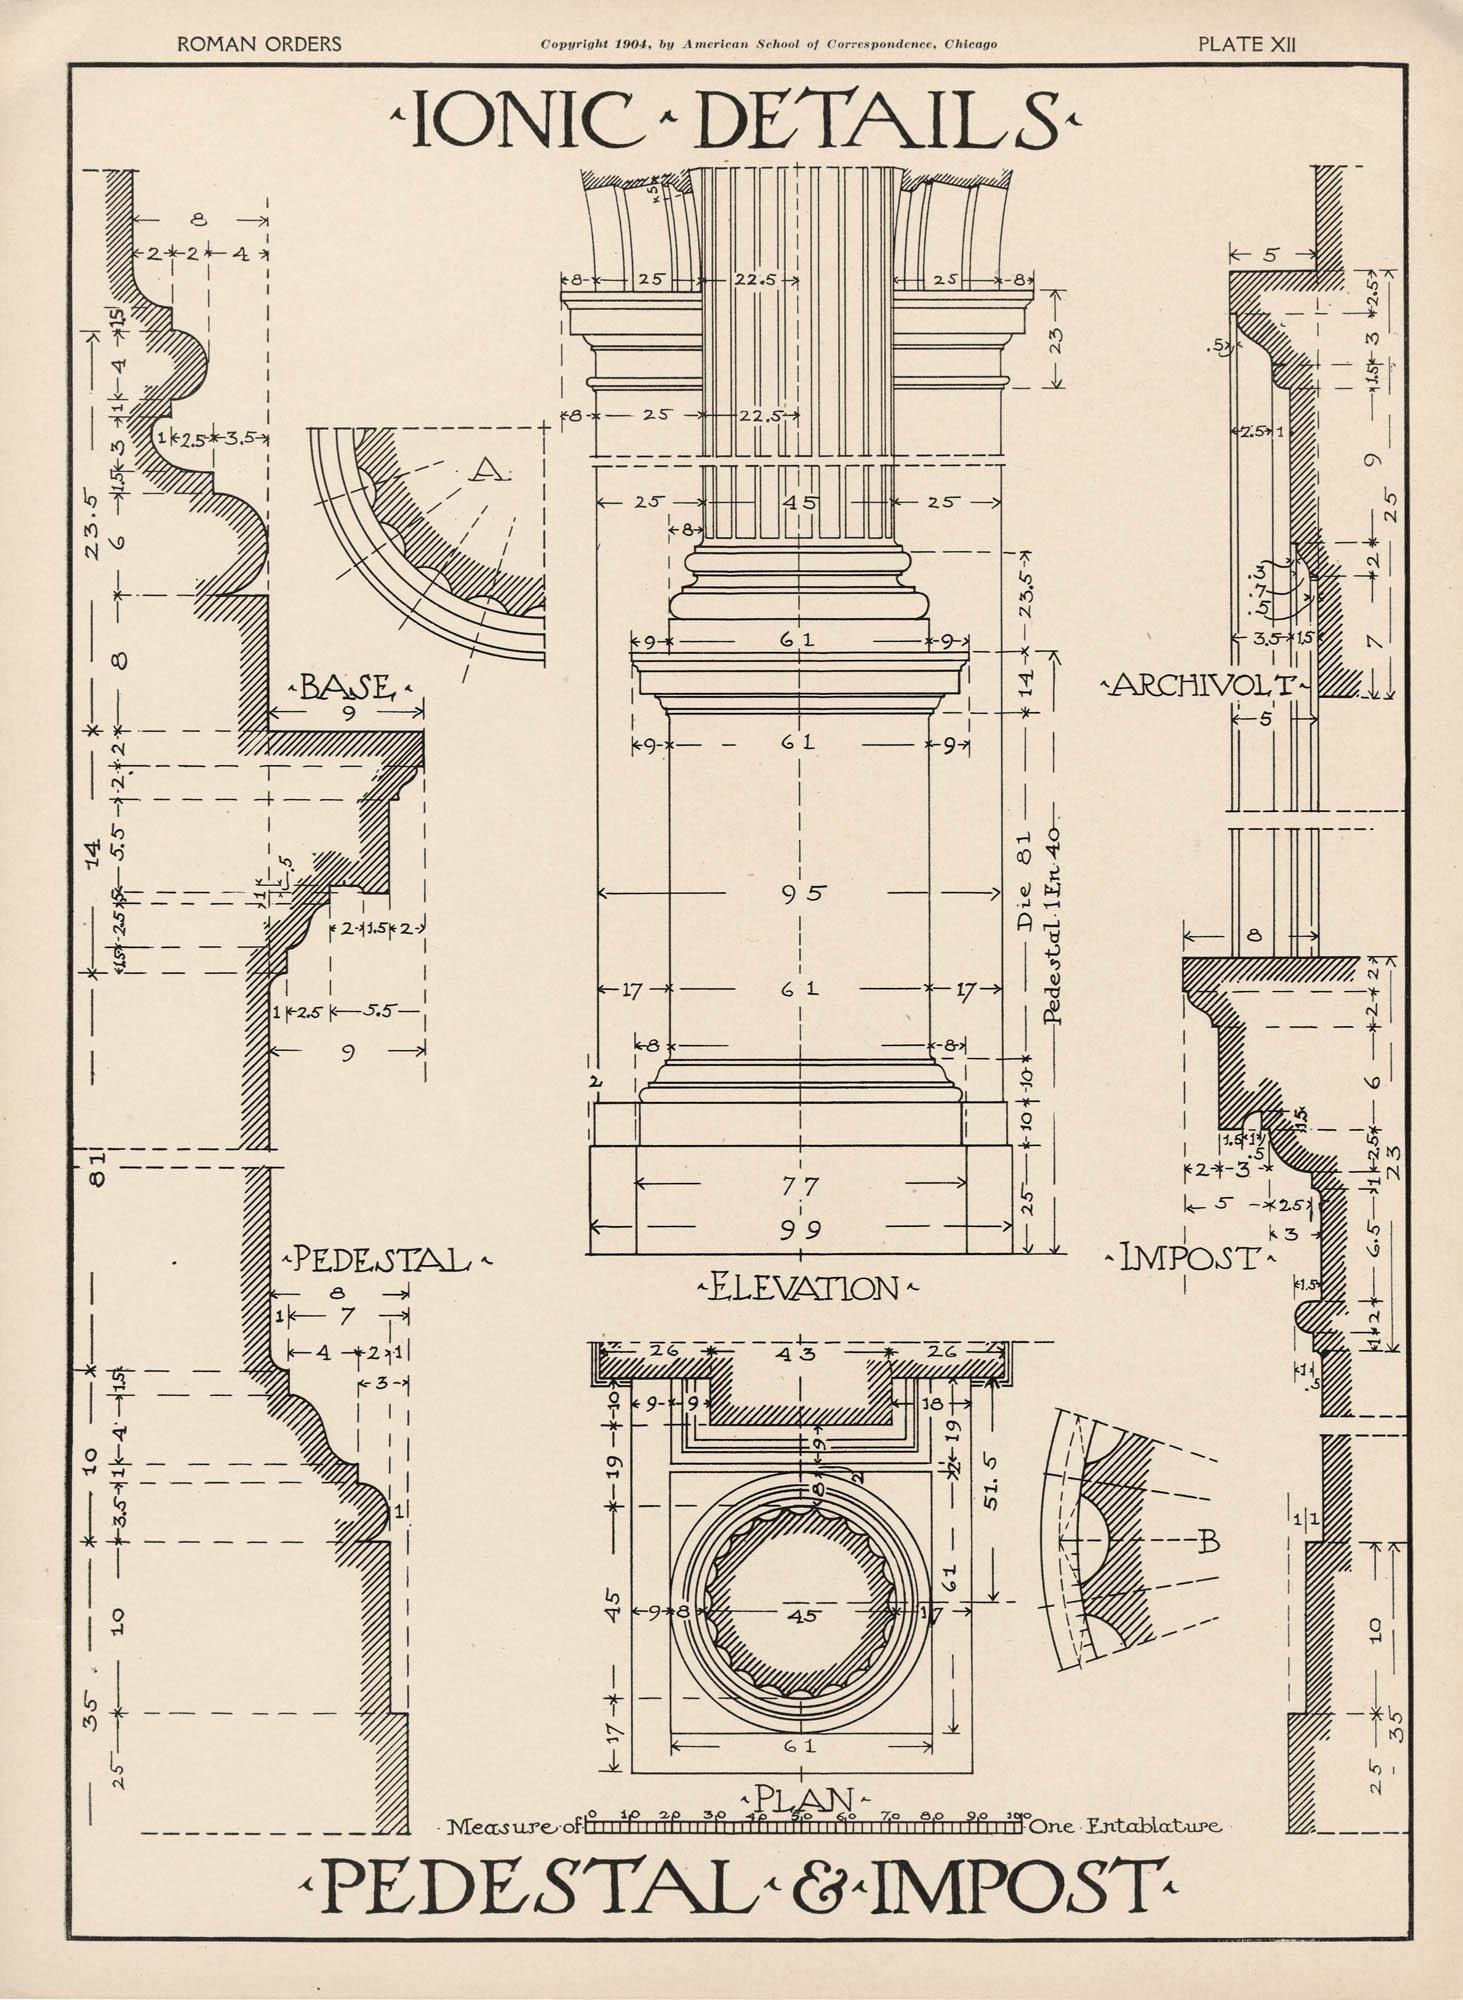 Plate 12